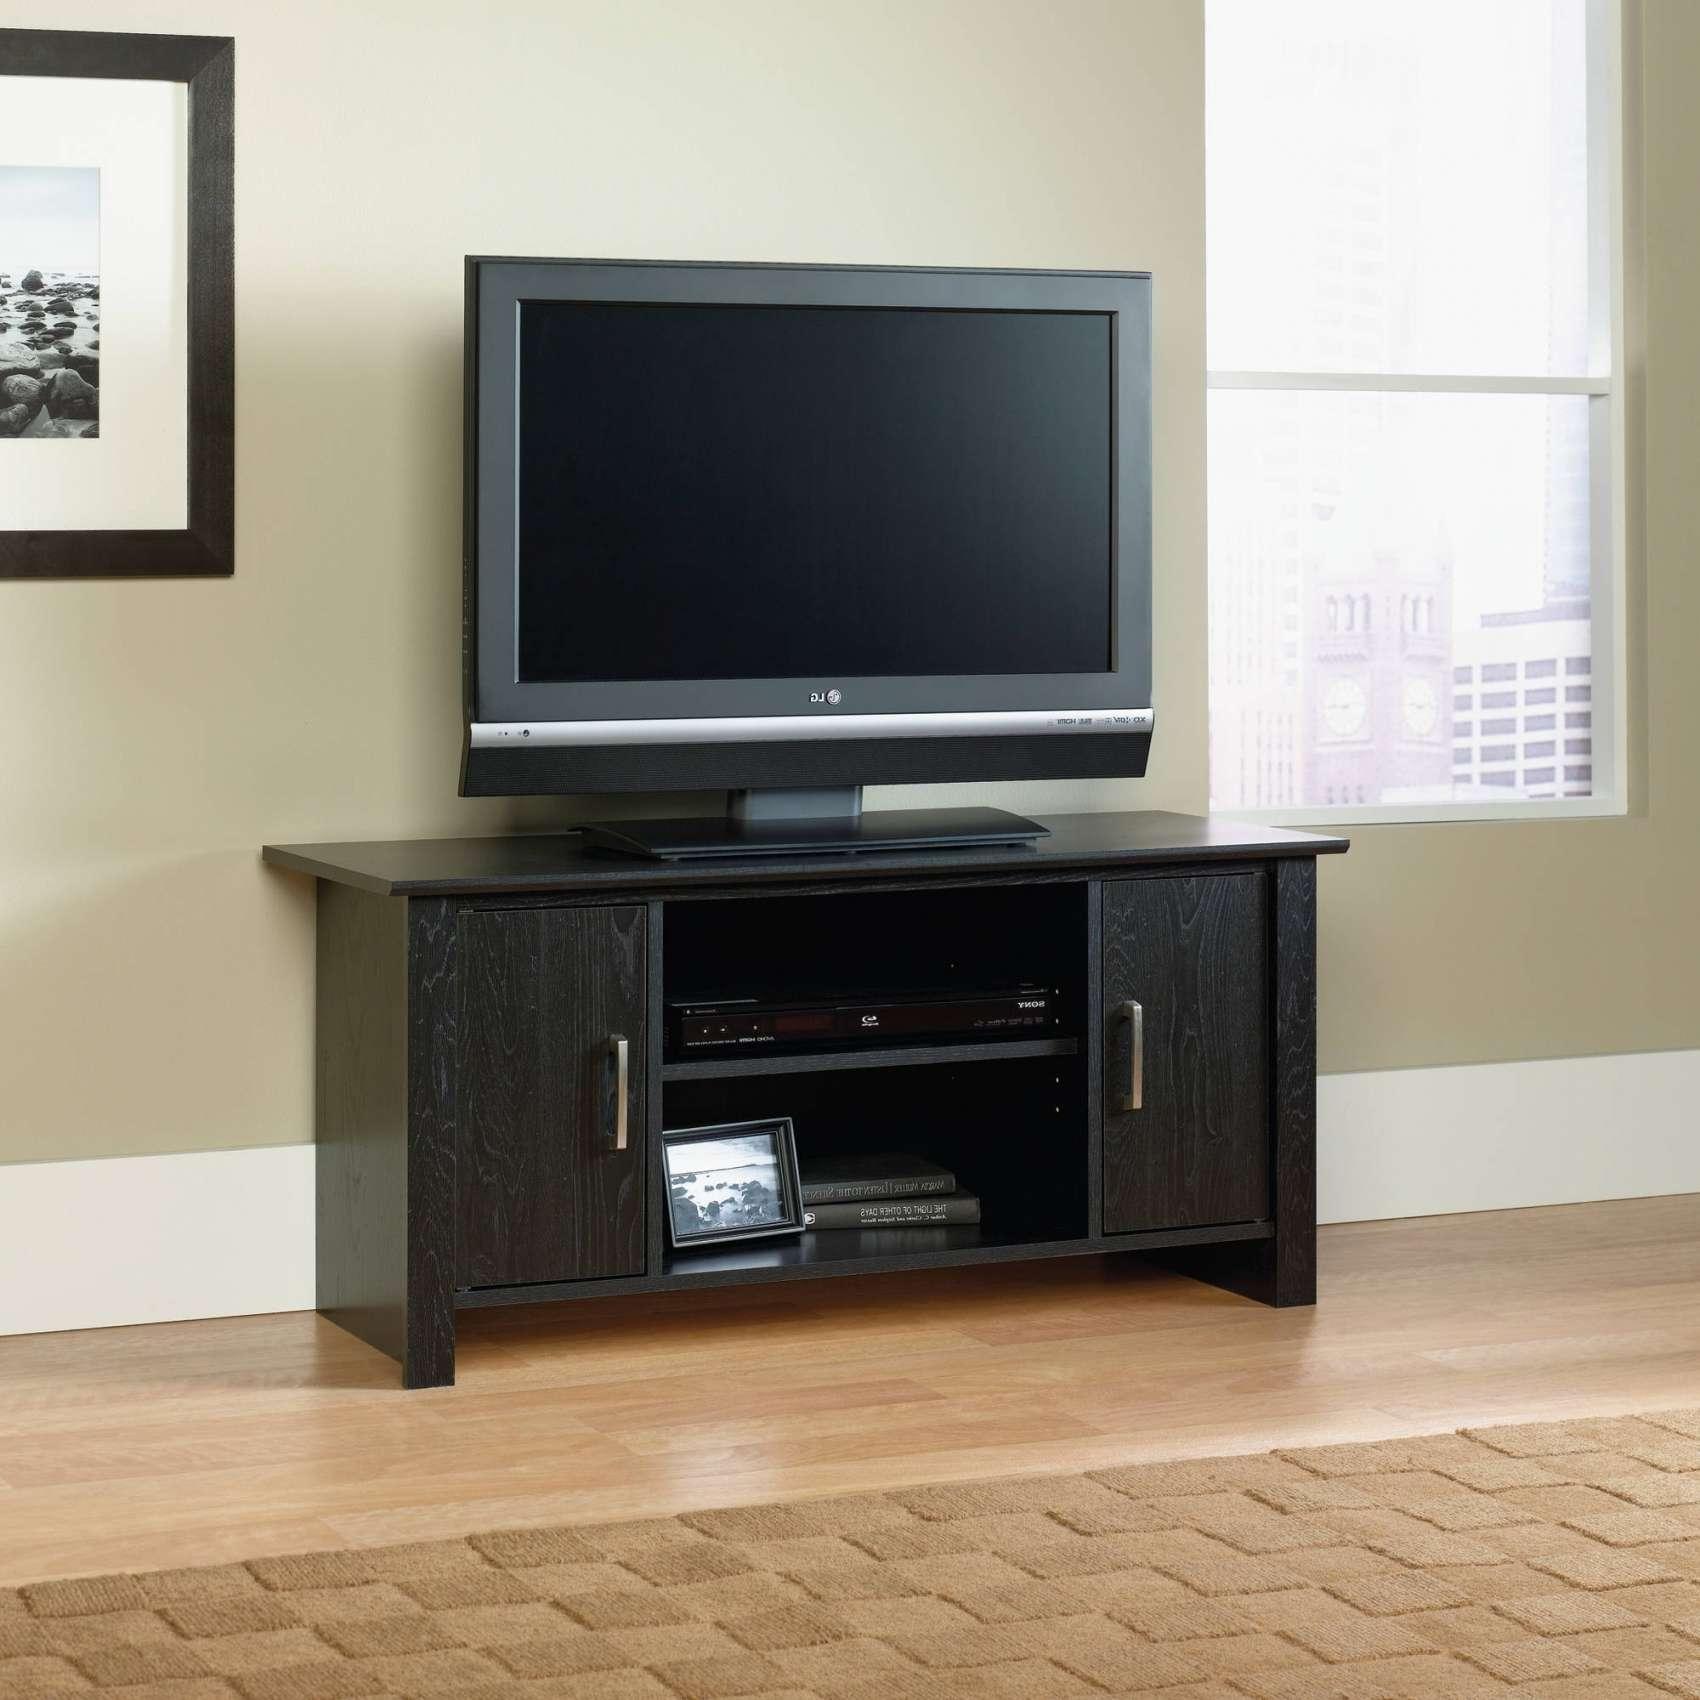 Luxury Tv Stands Big Lots Fresh – Best Furniture Gallery Regarding Big Lots Tv Stands (View 11 of 15)